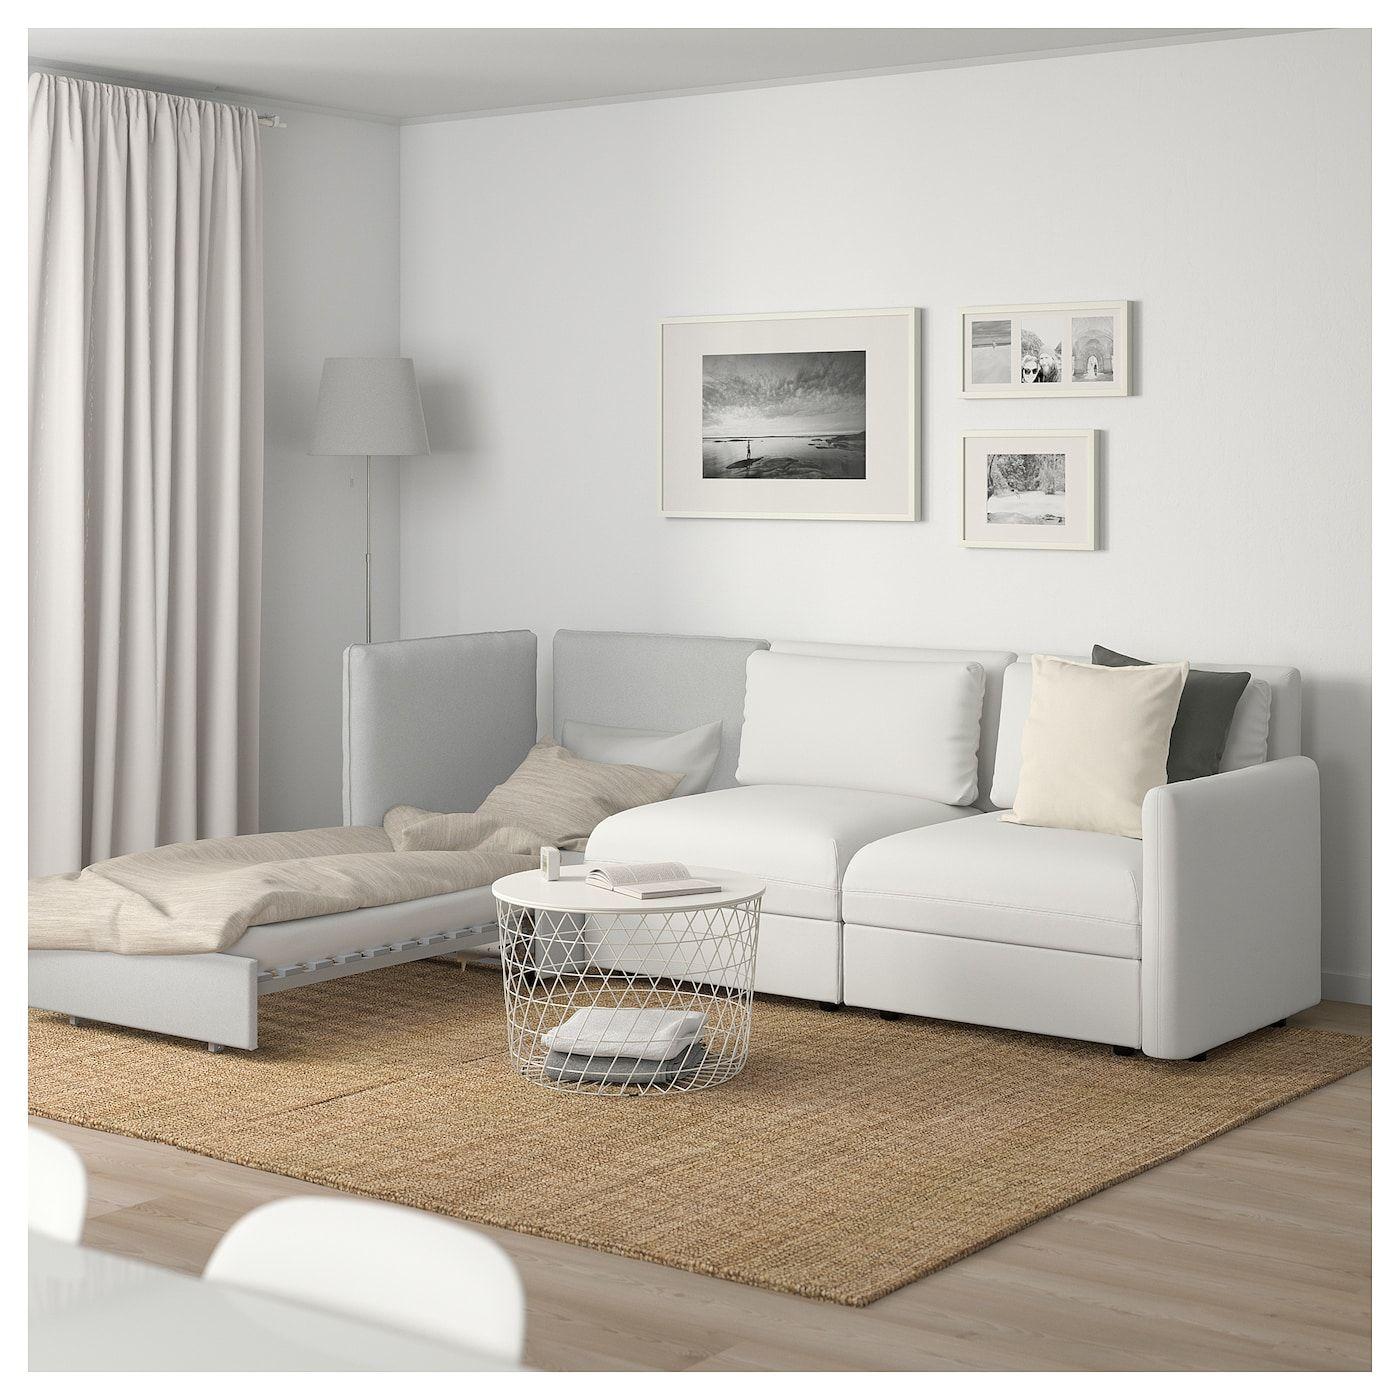 Vallentuna Canape Modulaire 3 Pl Avec Can Lit Et Rangement Murum Orrsta Blanc Gris Clair Magasinez Chez Ikea Ikea Corner Sofa Bed With Storage Vallentuna Sofa Bed With Storage